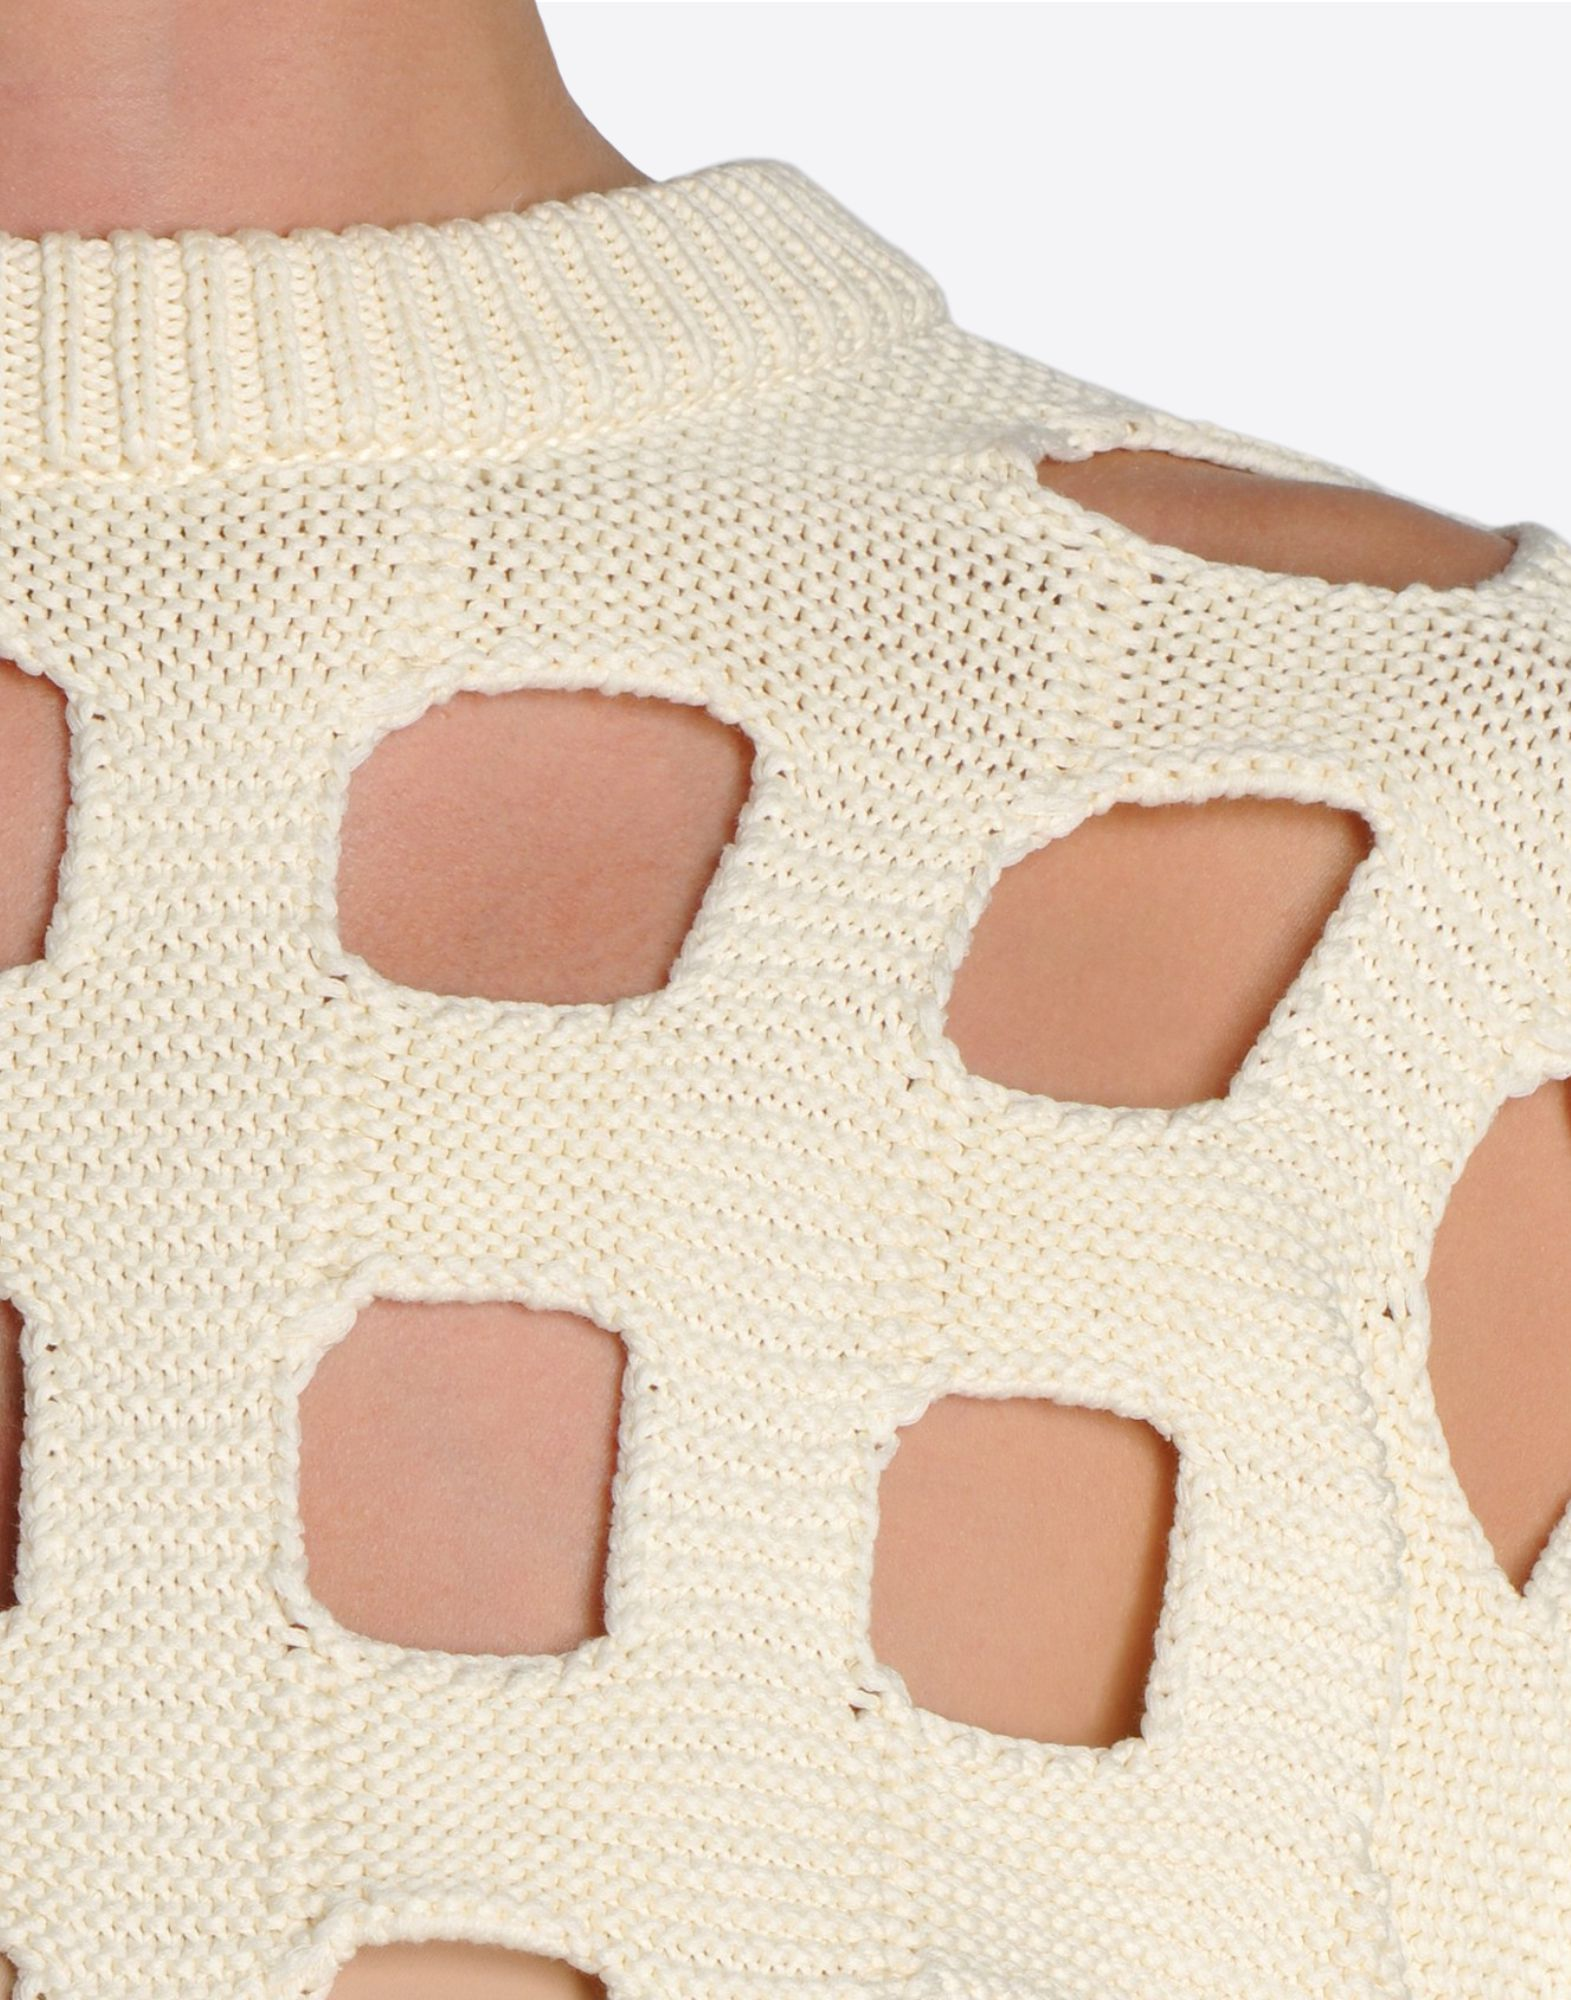 MAISON MARGIELA 1 Knit sweater with cut-out checks Long sleeve sweater Woman e